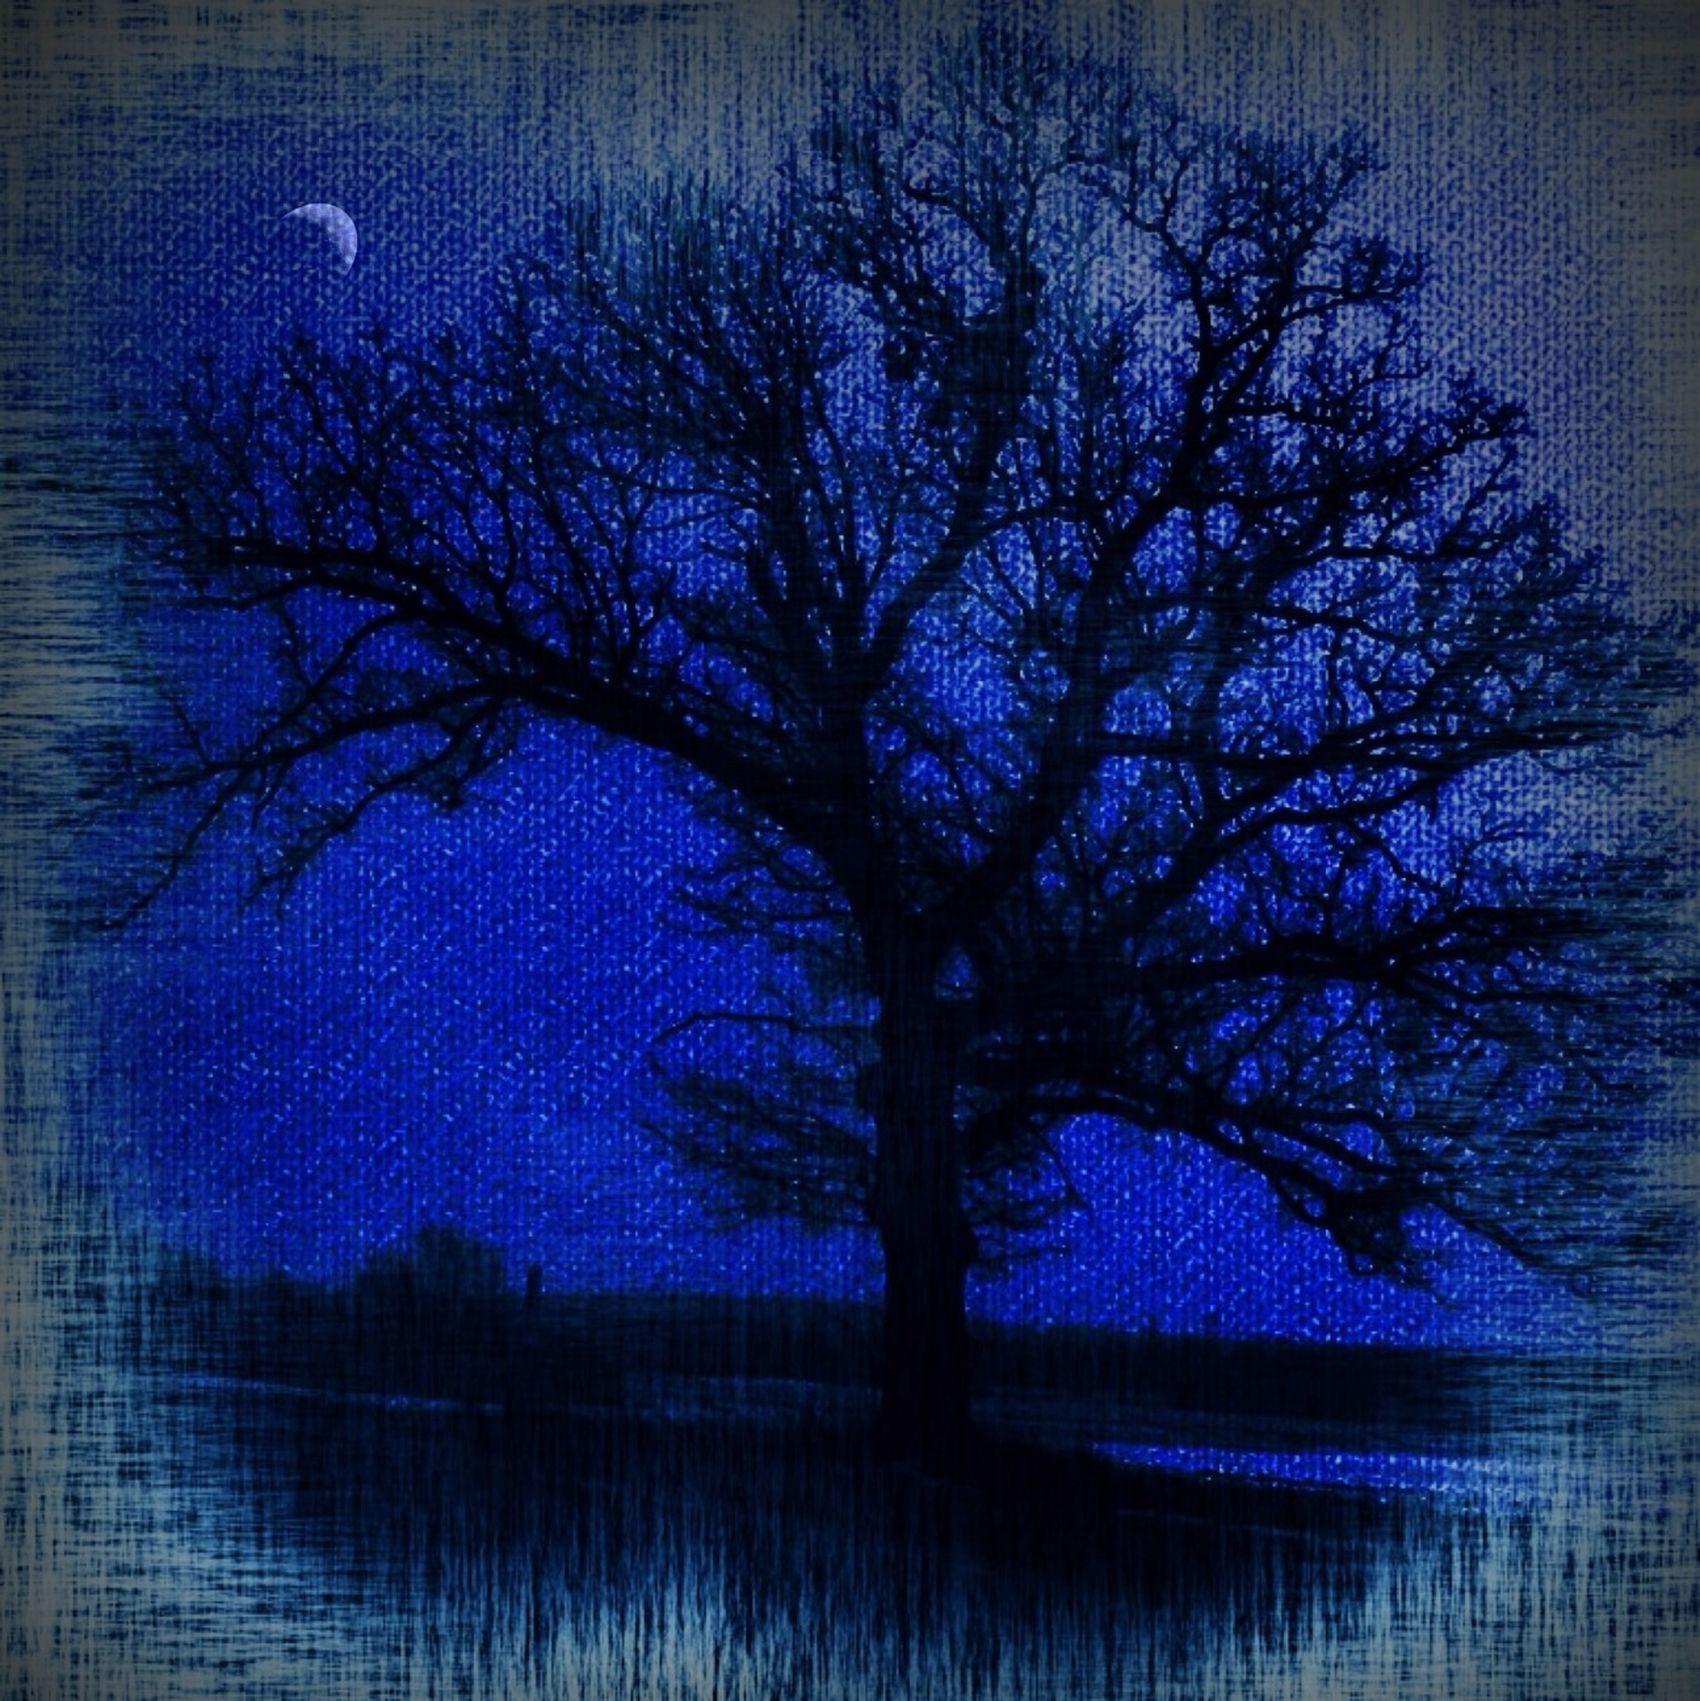 Goodnight EyeEm Goodnight Rural Scenes Canvas AMPt_community